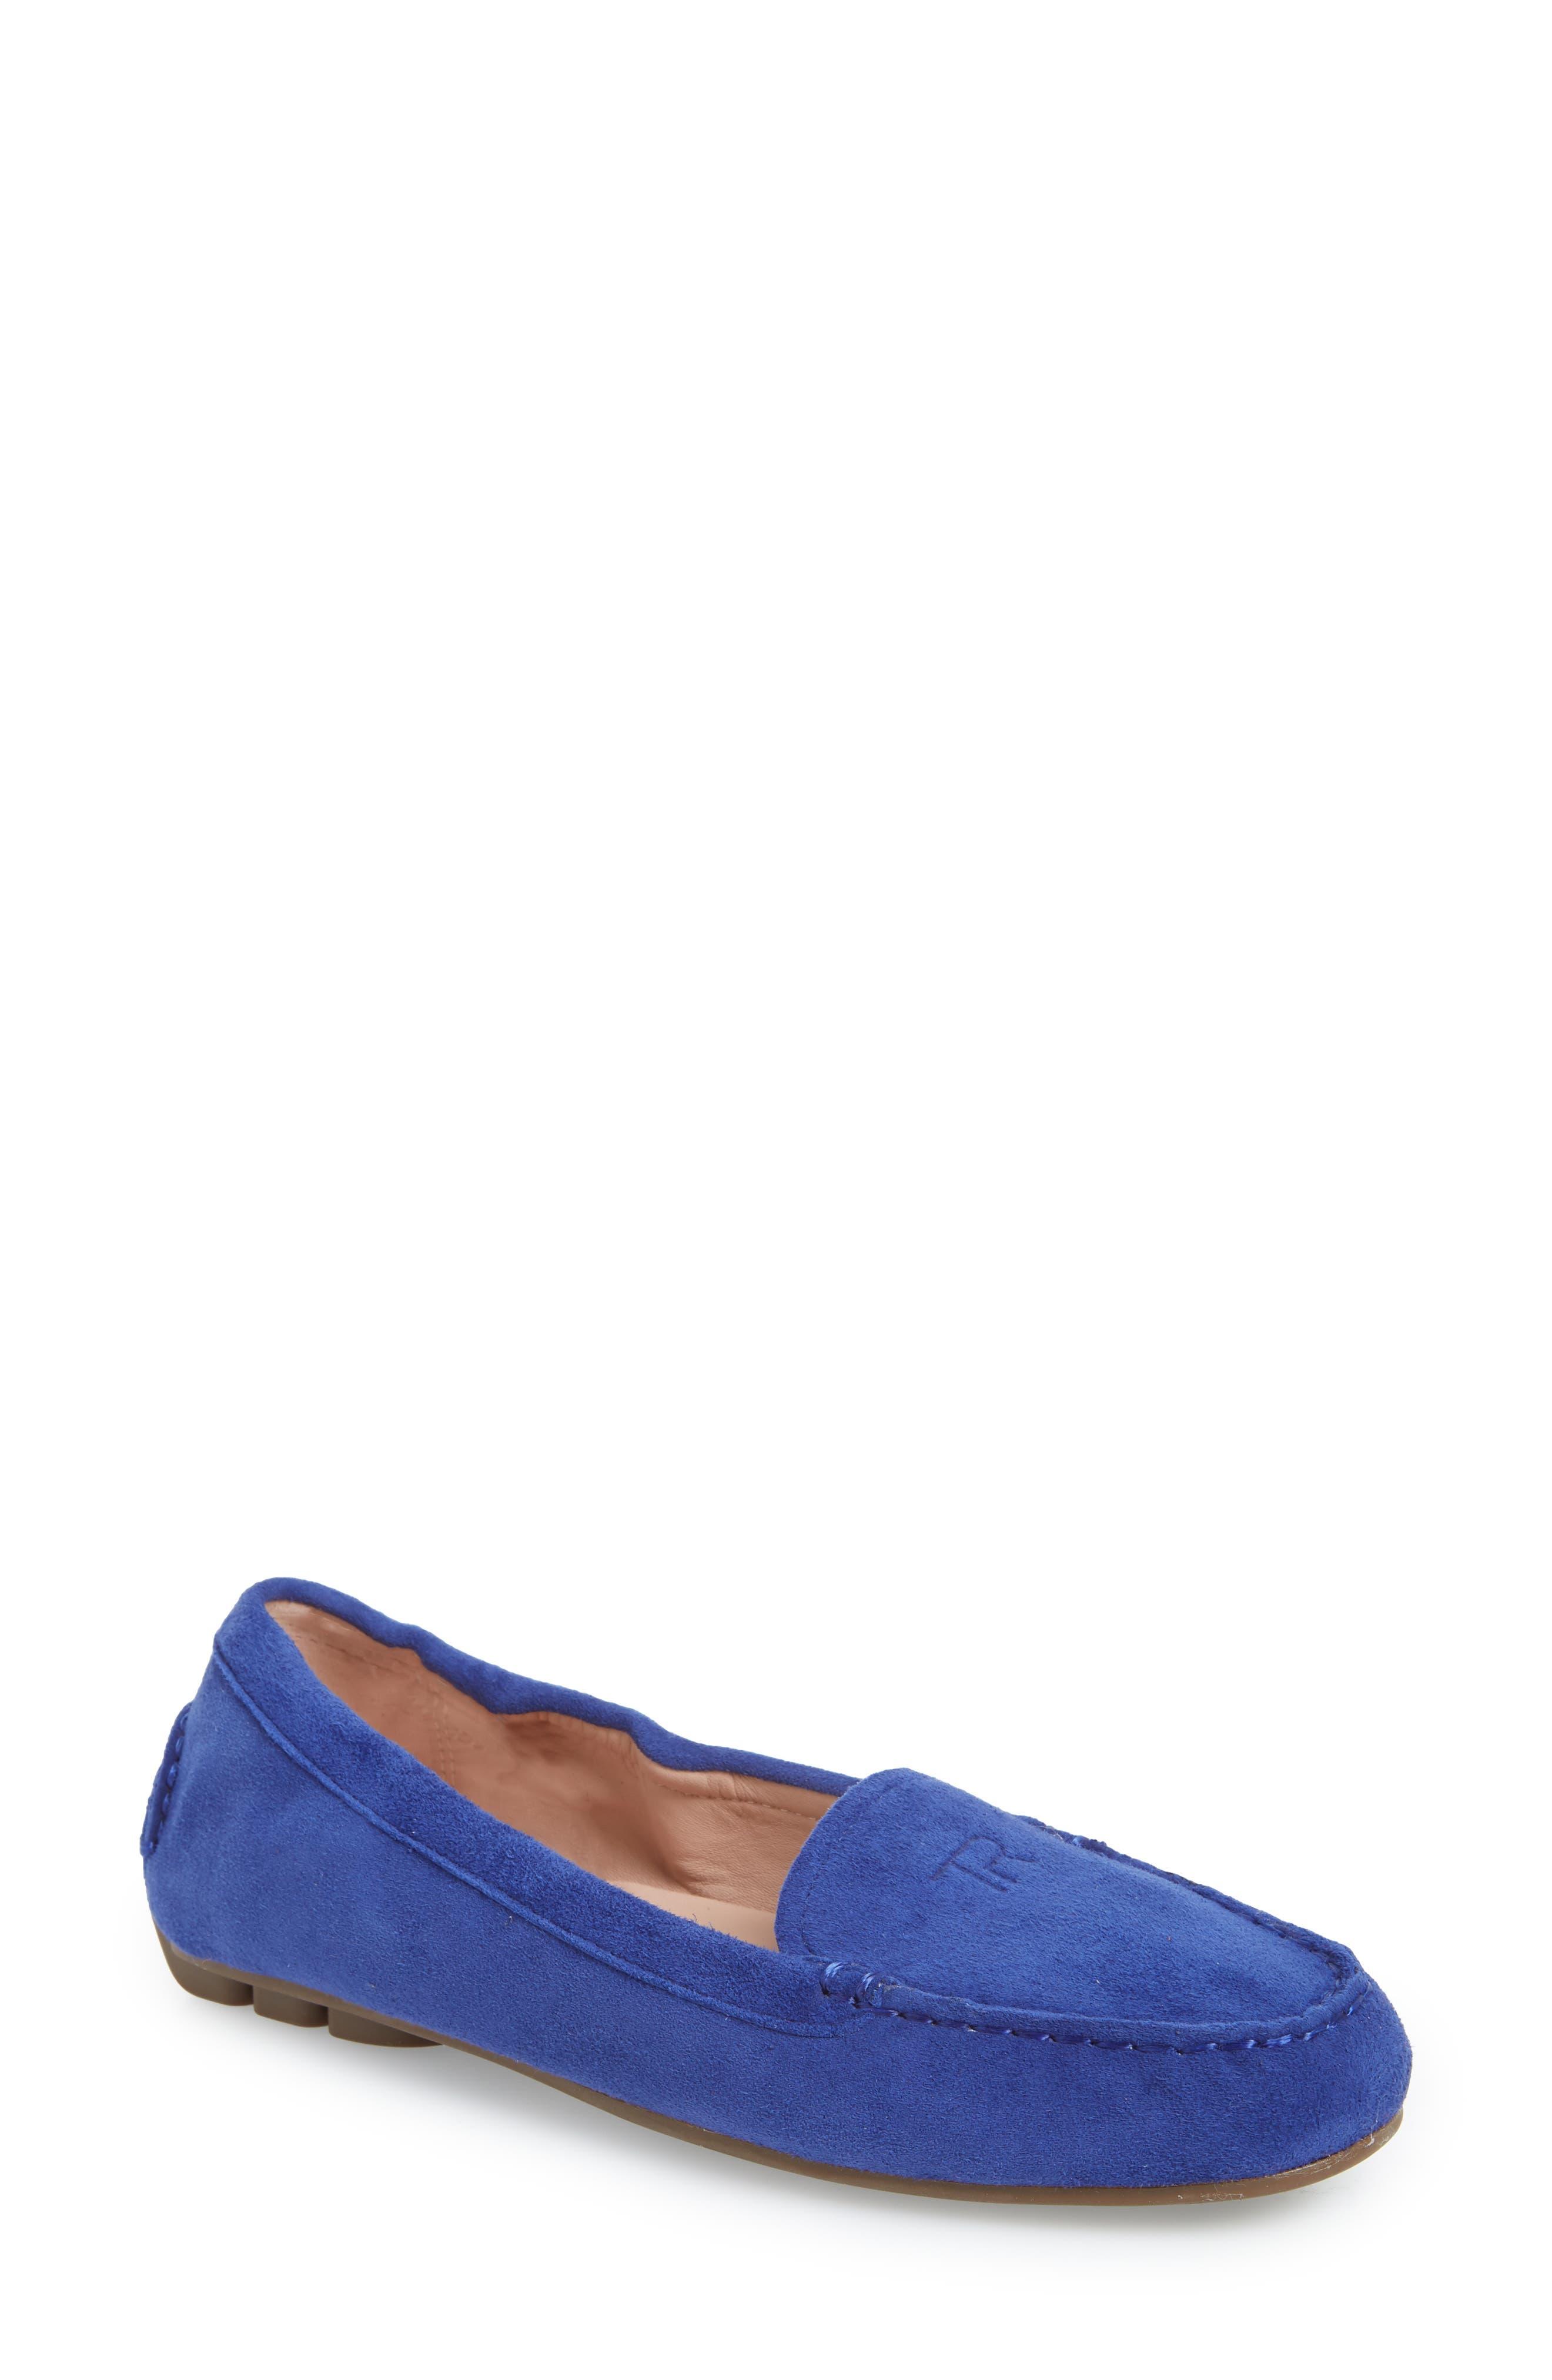 Kristine Loafer,                         Main,                         color, BLUE SUEDE